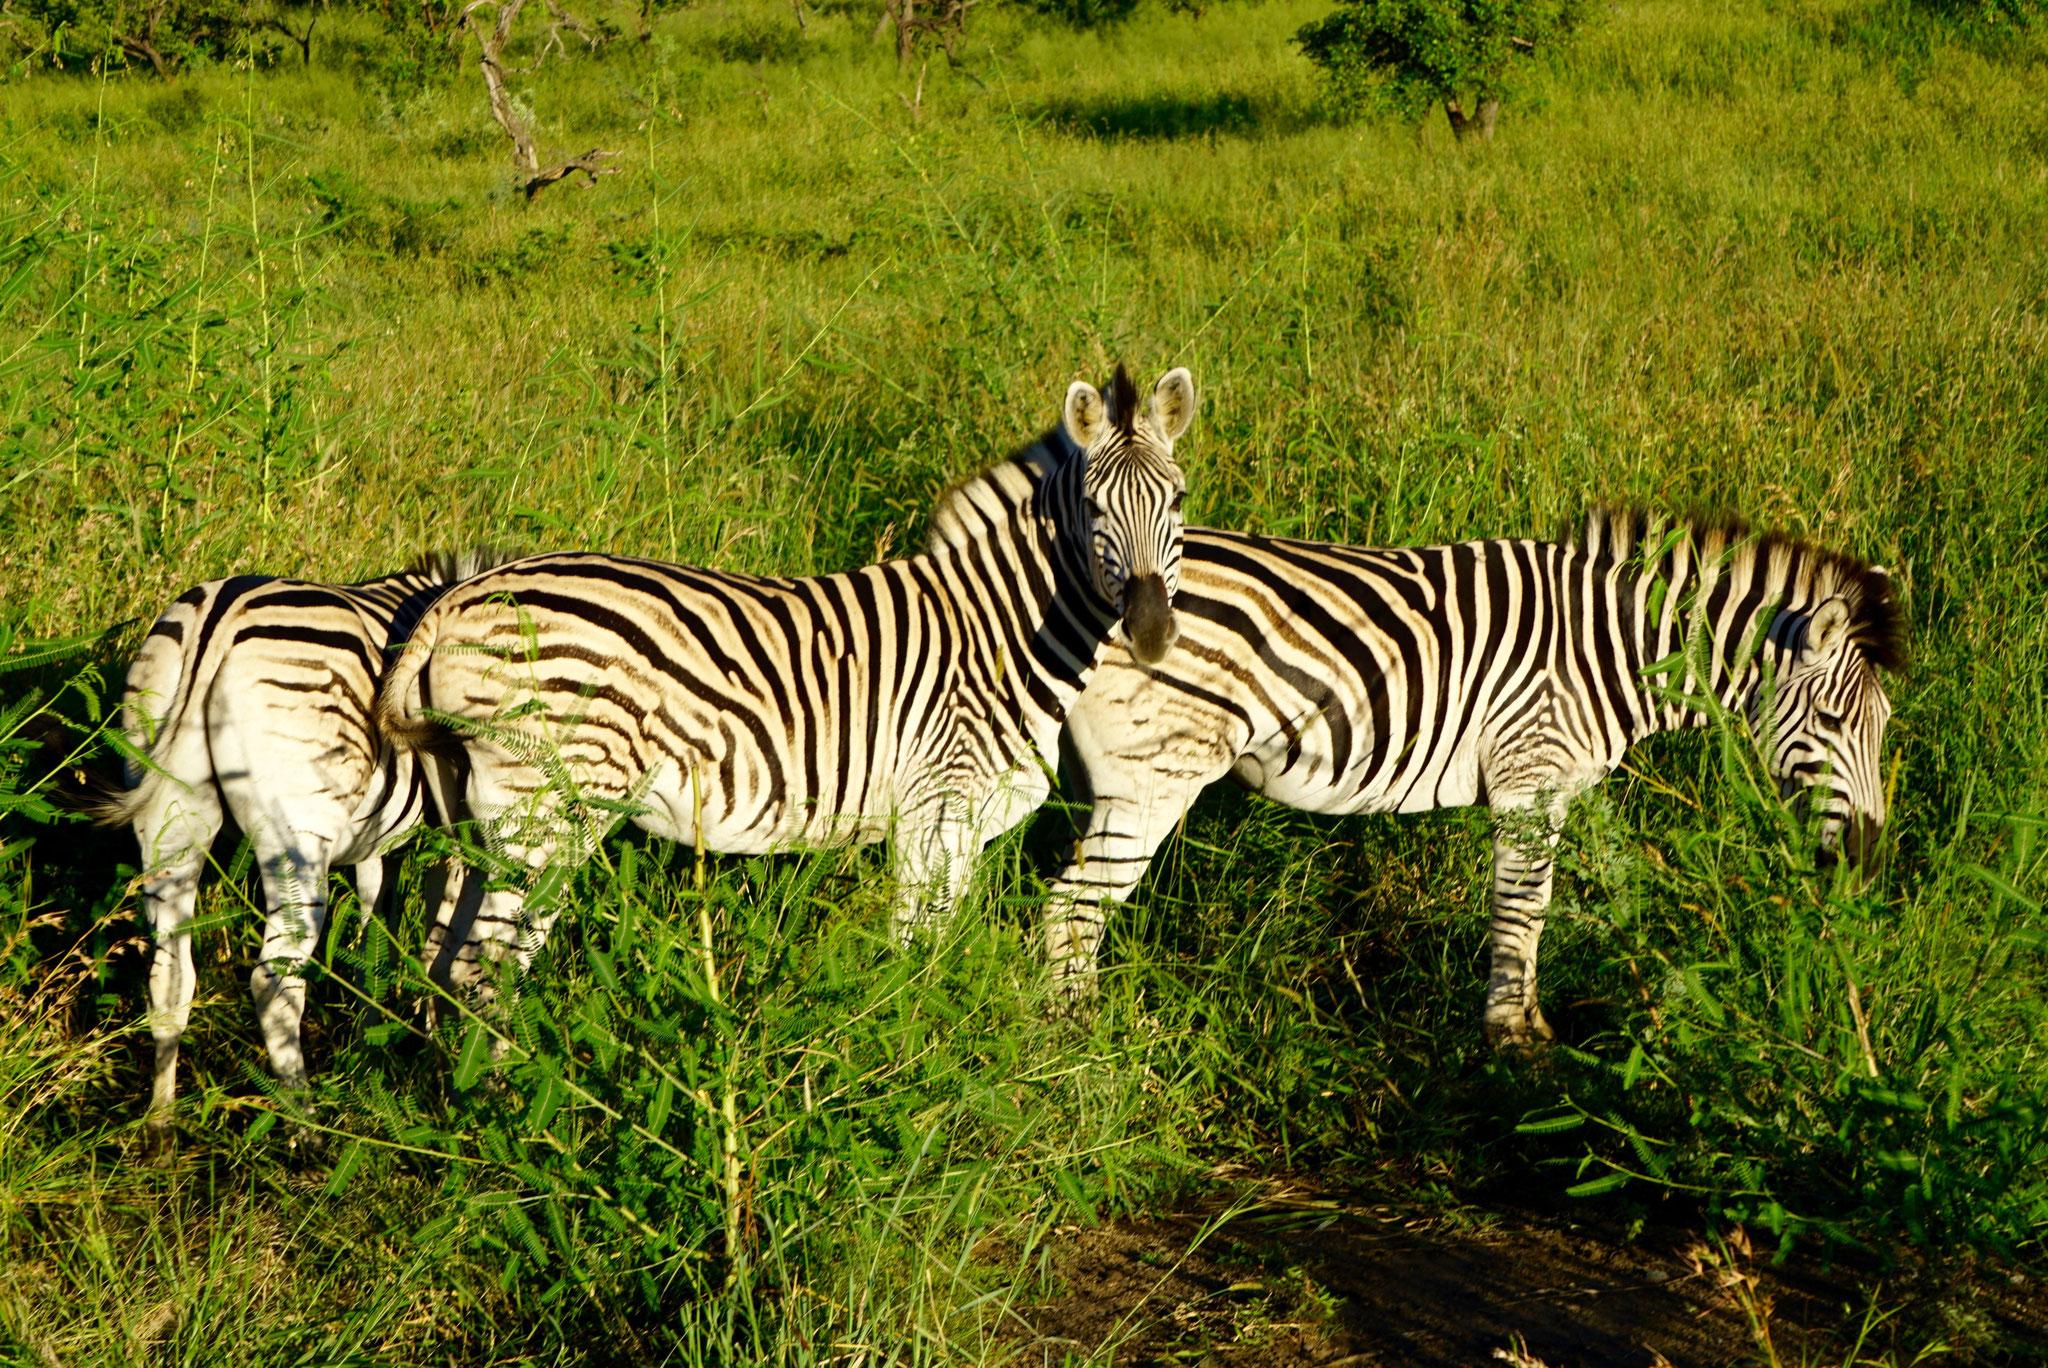 Bild: Zebras